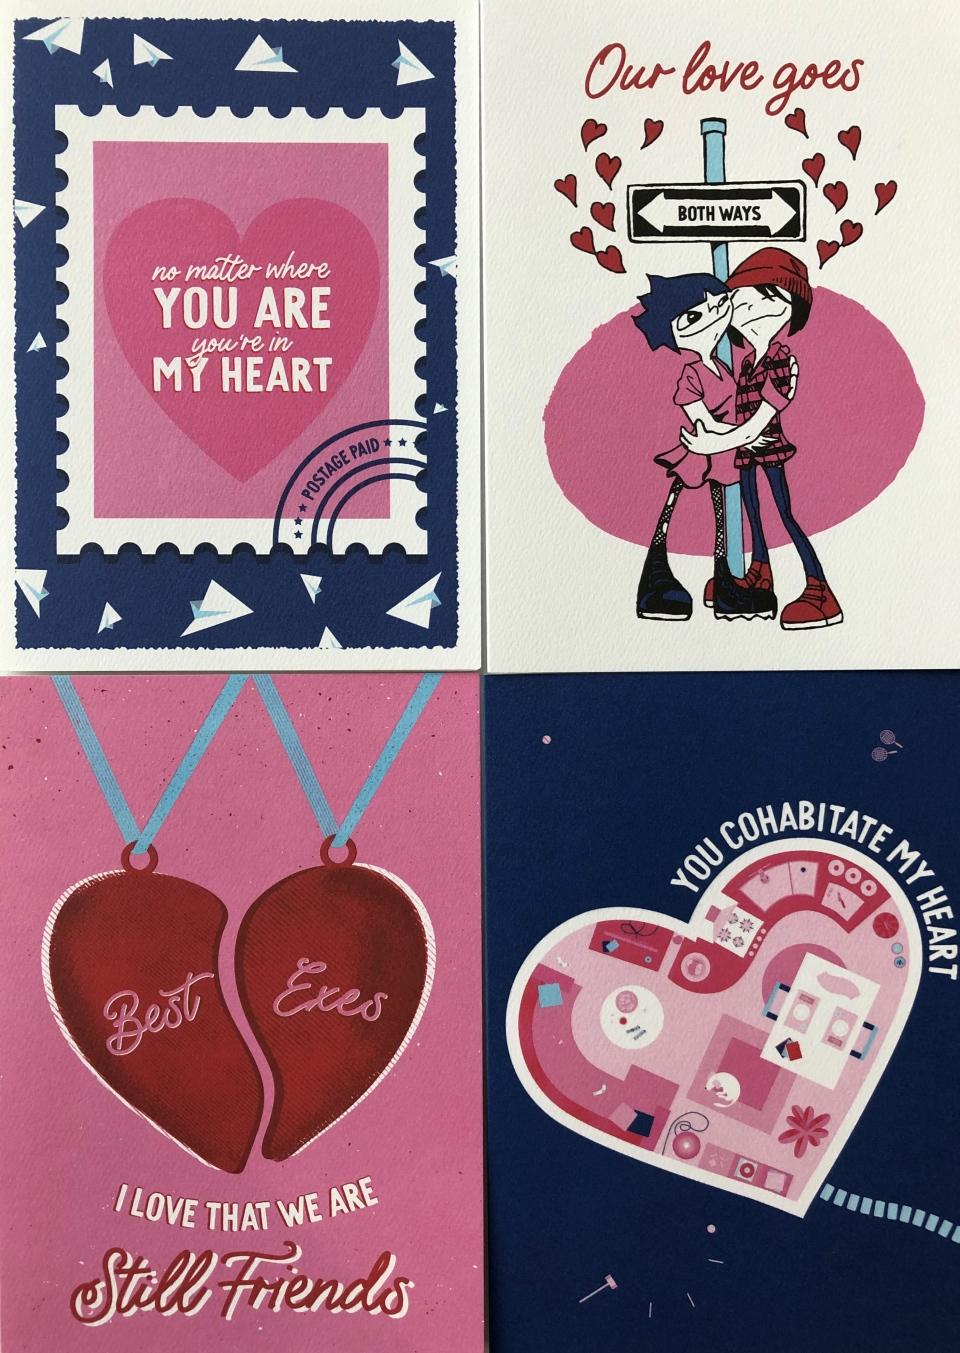 London Drugs' inclusive Valentine's cards